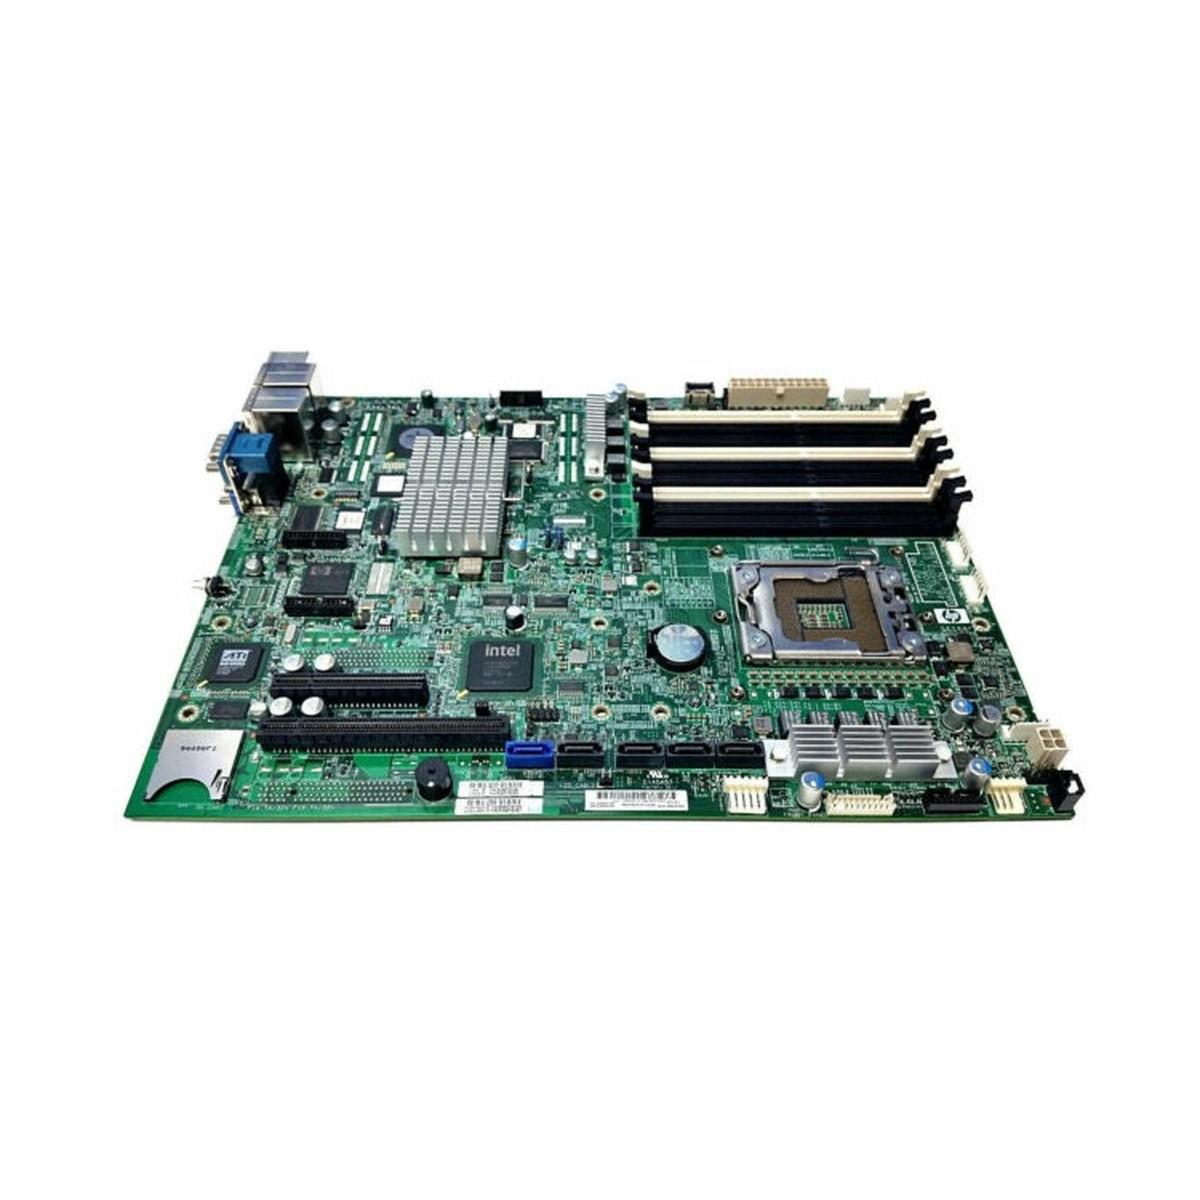 Organizer kabli HP DL380 G8 737414-001 2U